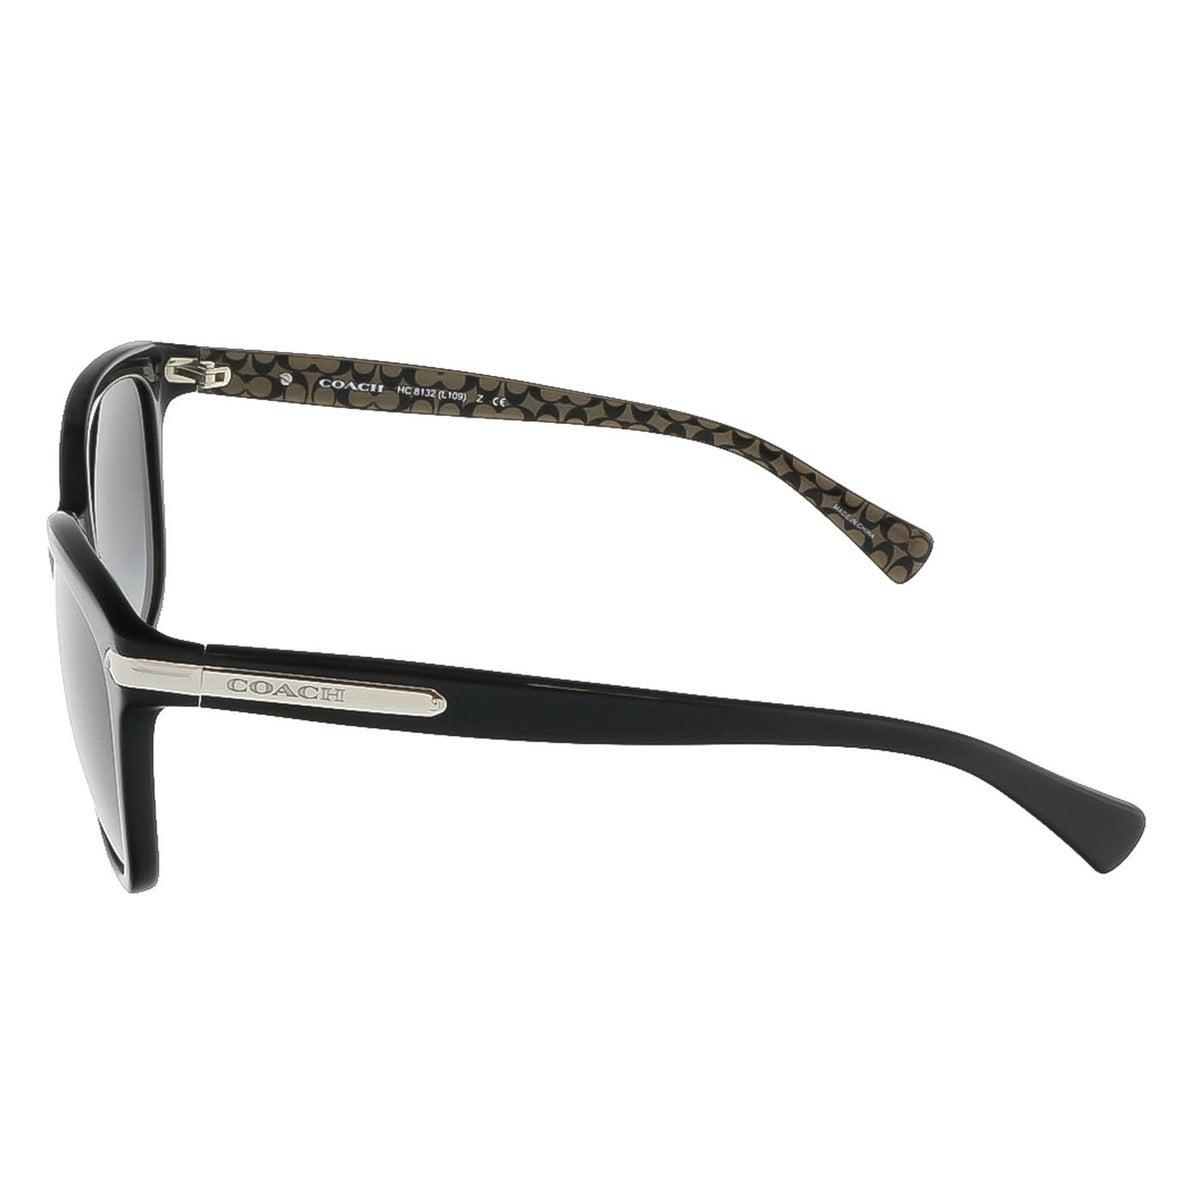 1a33a0bfa1c Shop Coach HC8132 526111 Black Military Sig C Wayfarer sunglasses -  57-17-135 - Free Shipping Today - Overstock - 13401939